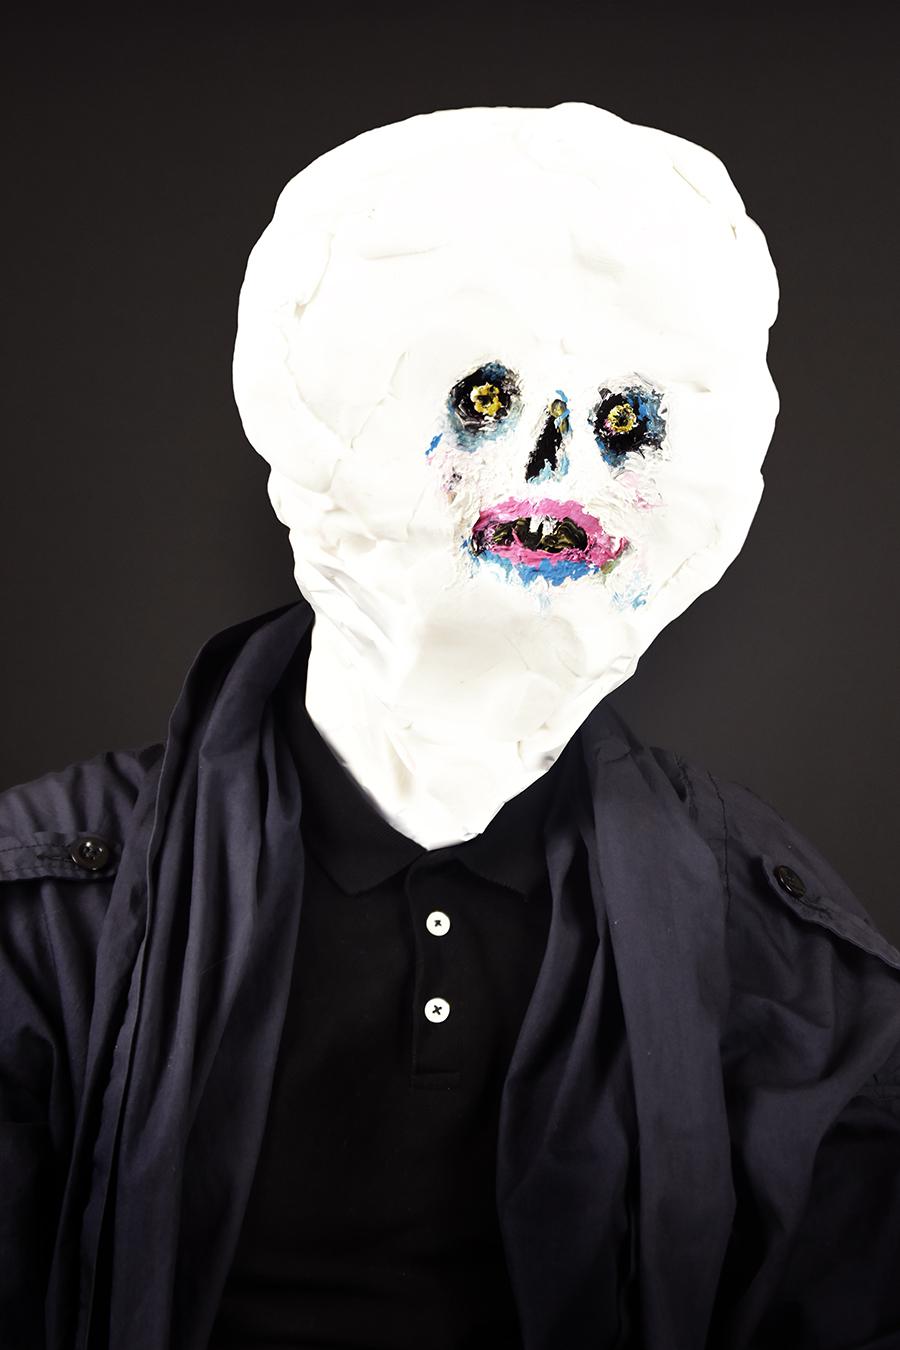 Tomba-Lobos-Portrait-1.jpg